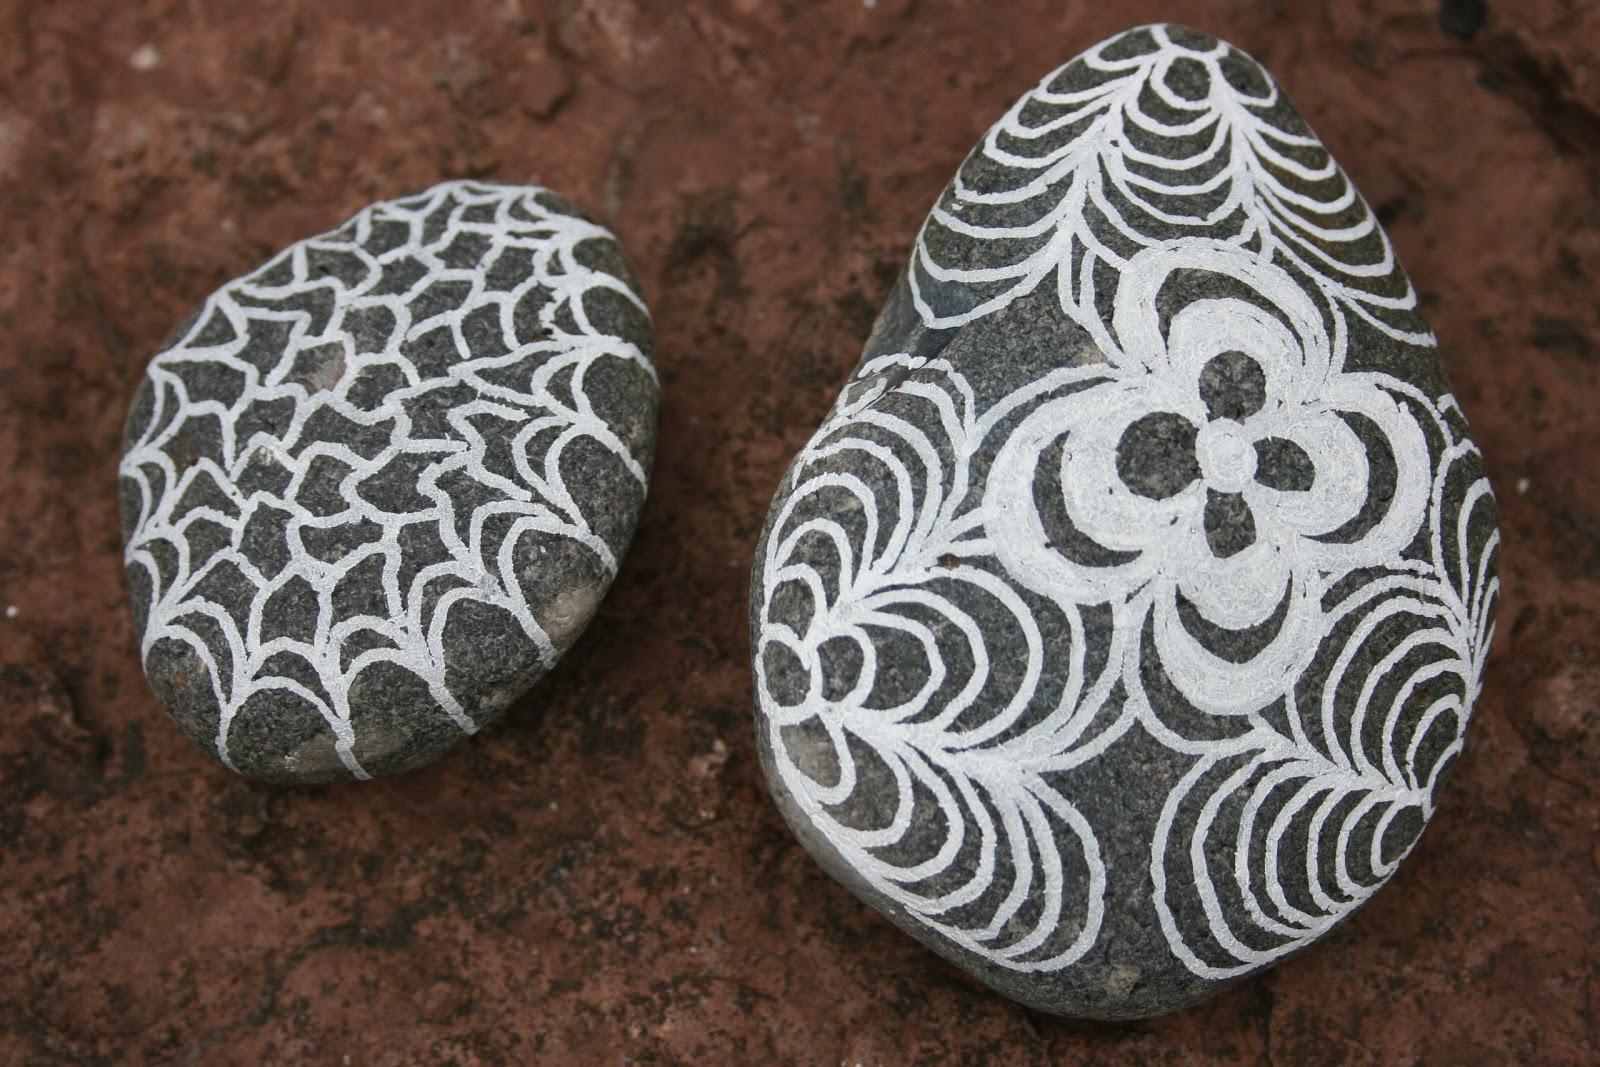 posca tusser på sten